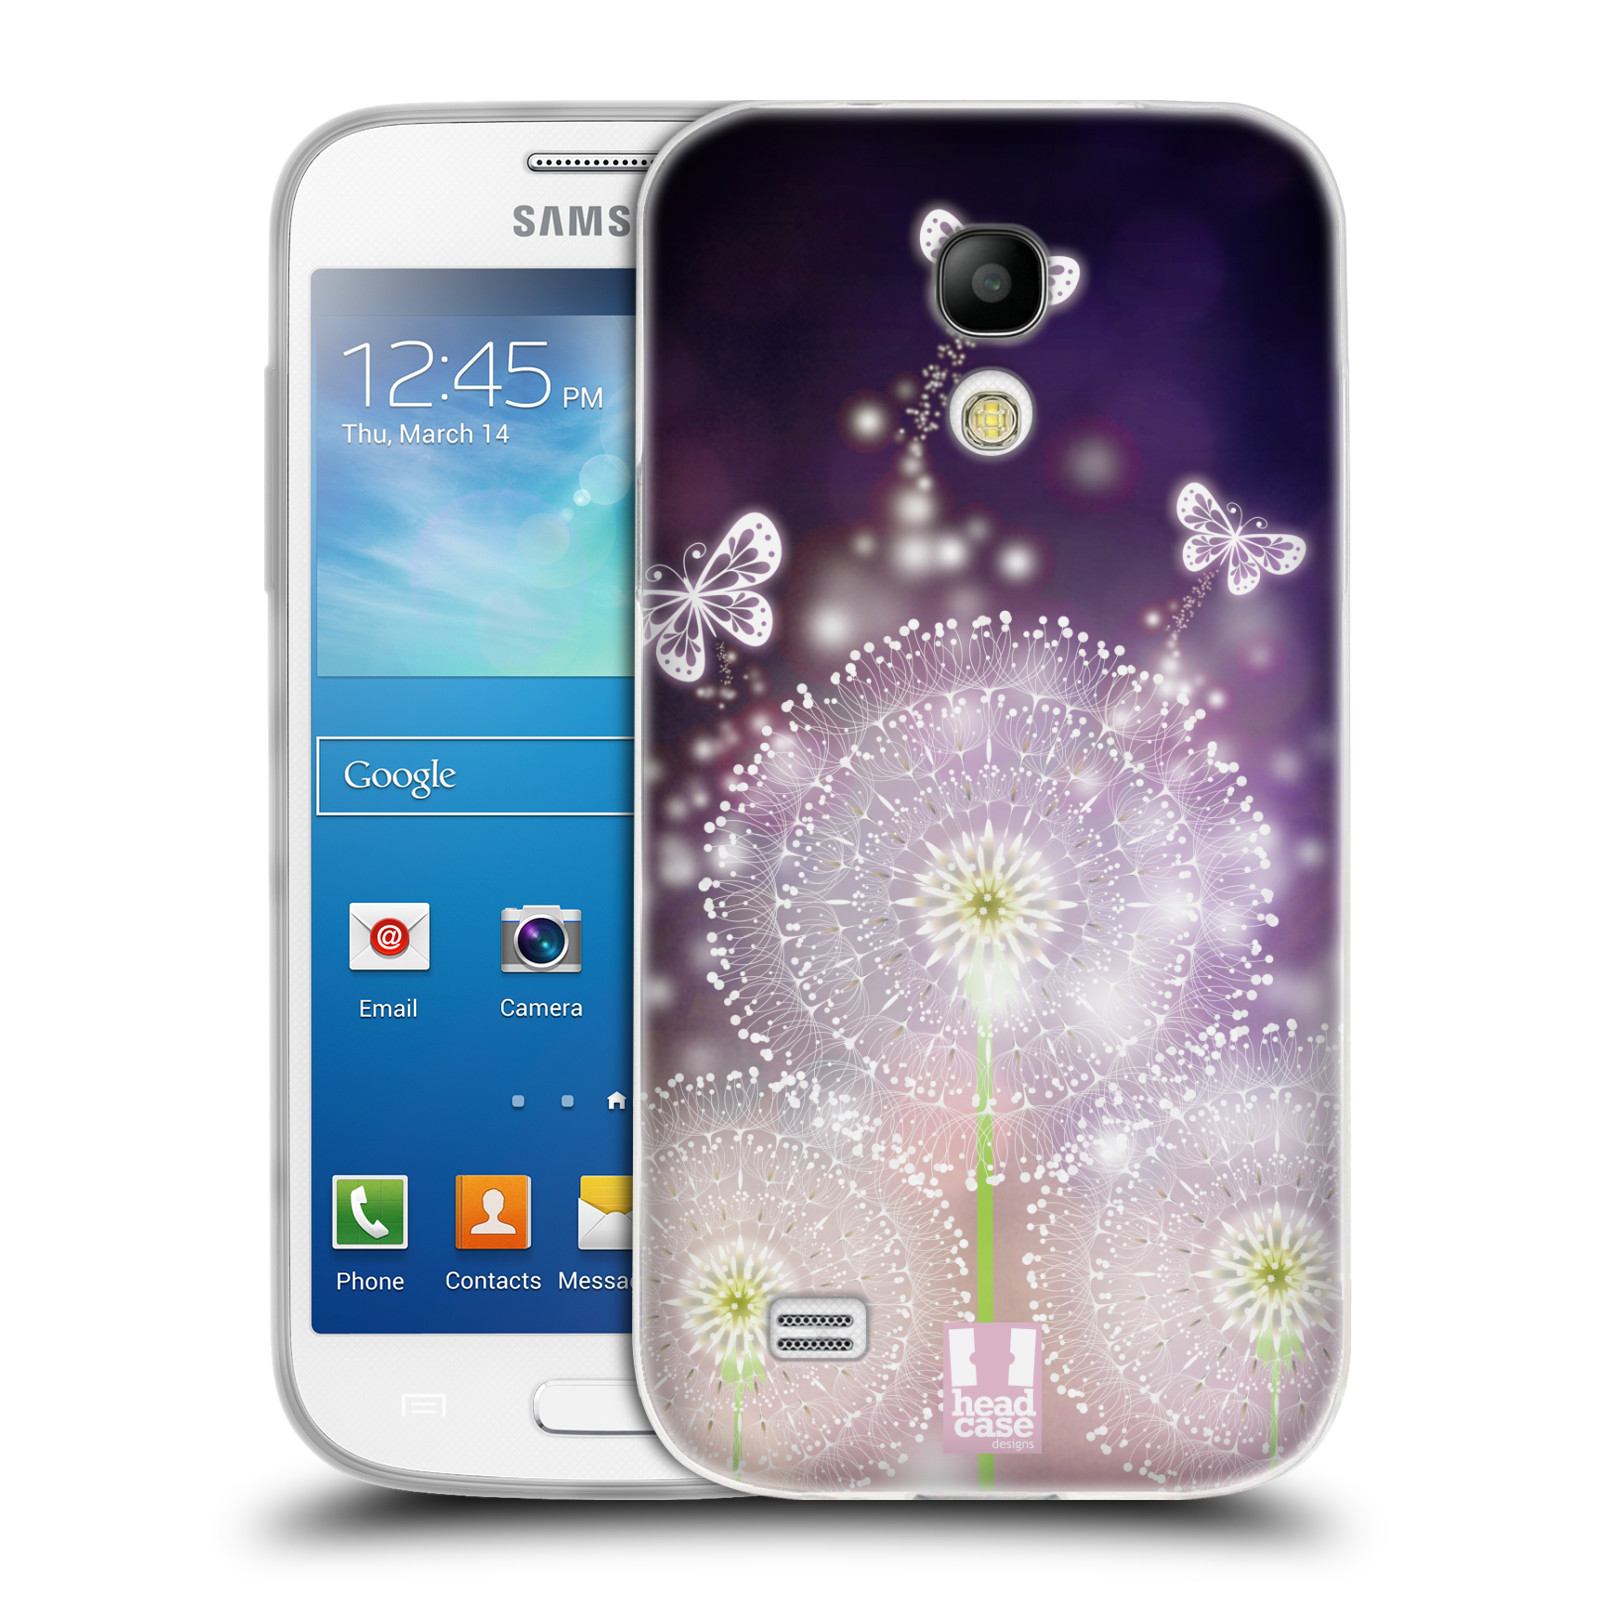 Silikonové pouzdro na mobil Samsung Galaxy S4 Mini HEAD CASE Pampelišky a Motýlci (Silikonový kryt či obal na mobilní telefon Samsung Galaxy S4 Mini GT-i9195 / i9190)